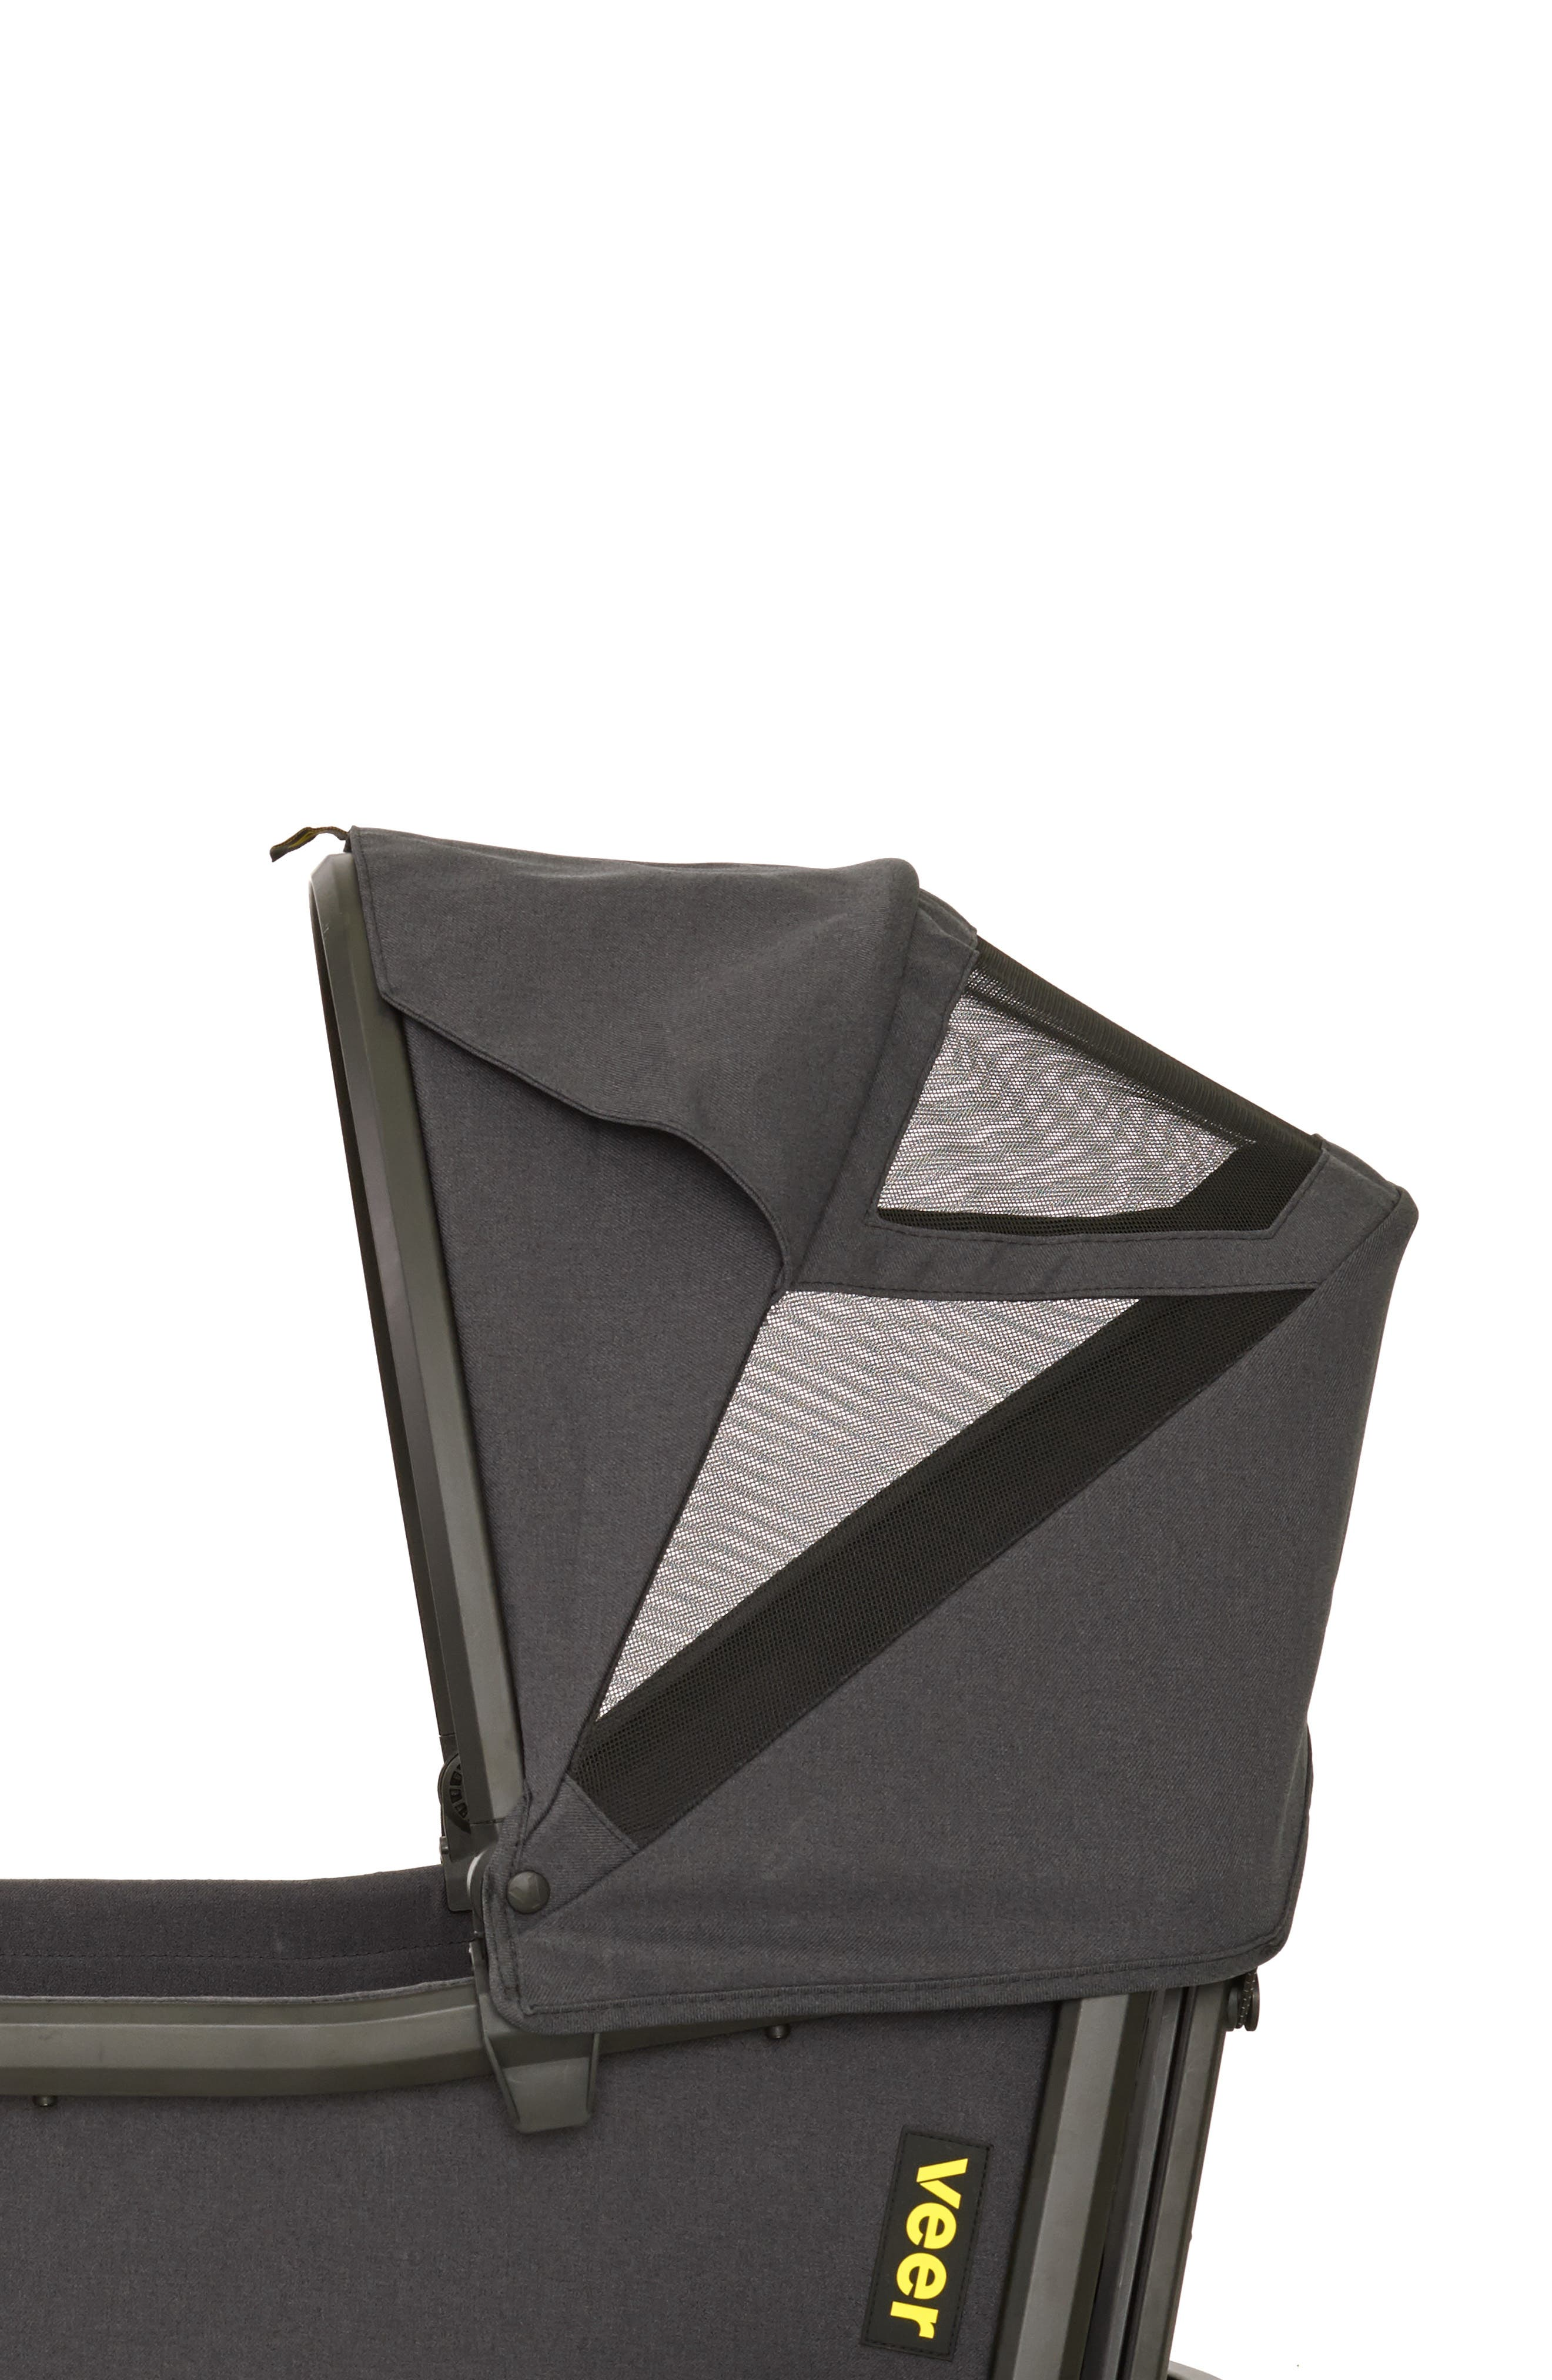 Retractable Canopy,                         Main,                         color, BLACK